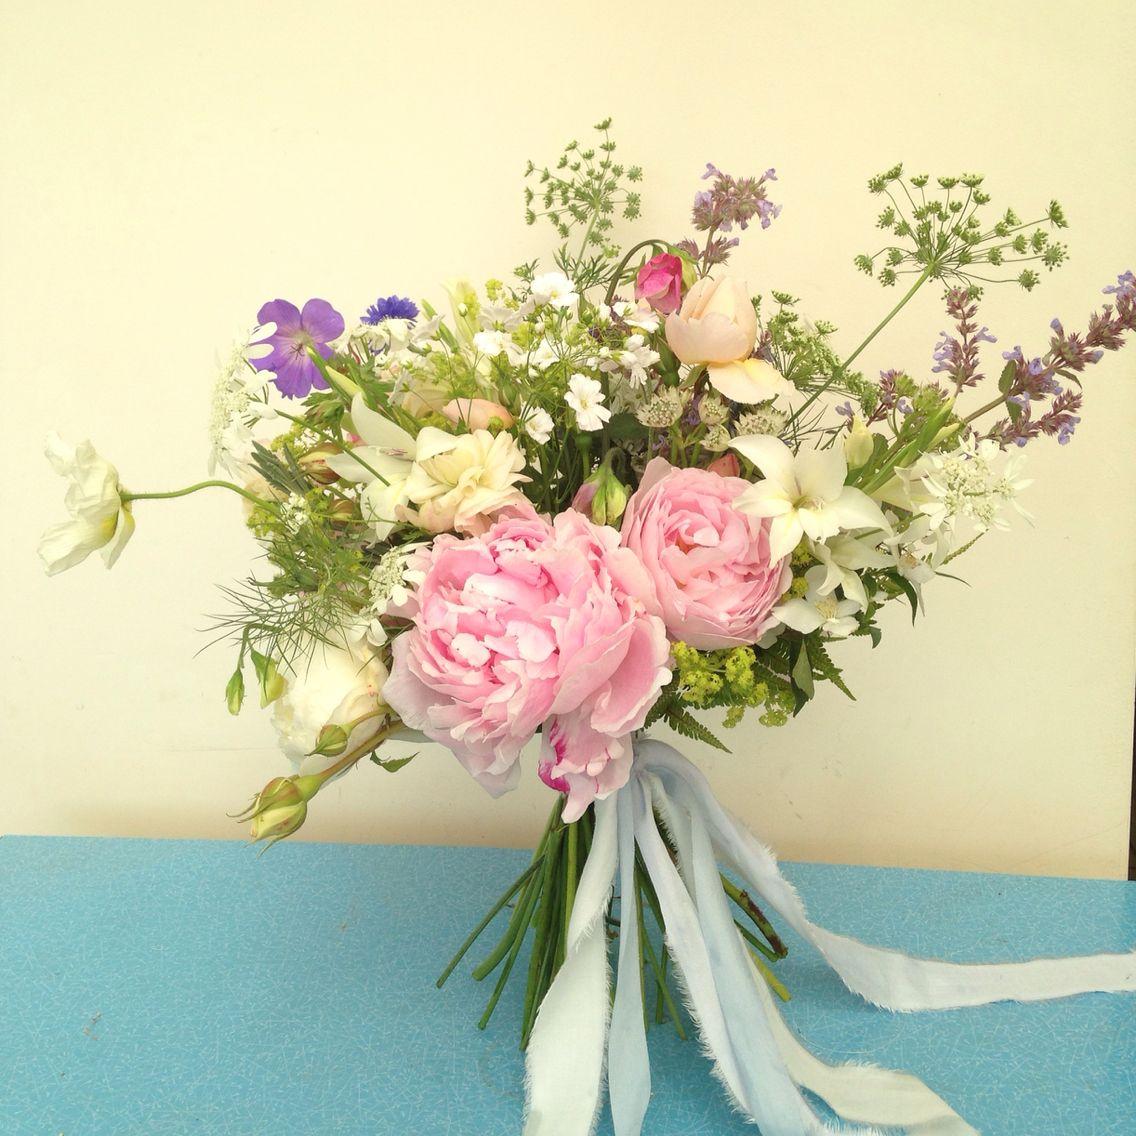 June Wedding Flower Bouquets: Late June Bridal Bouquet. 100% British Grown By BareBlooms